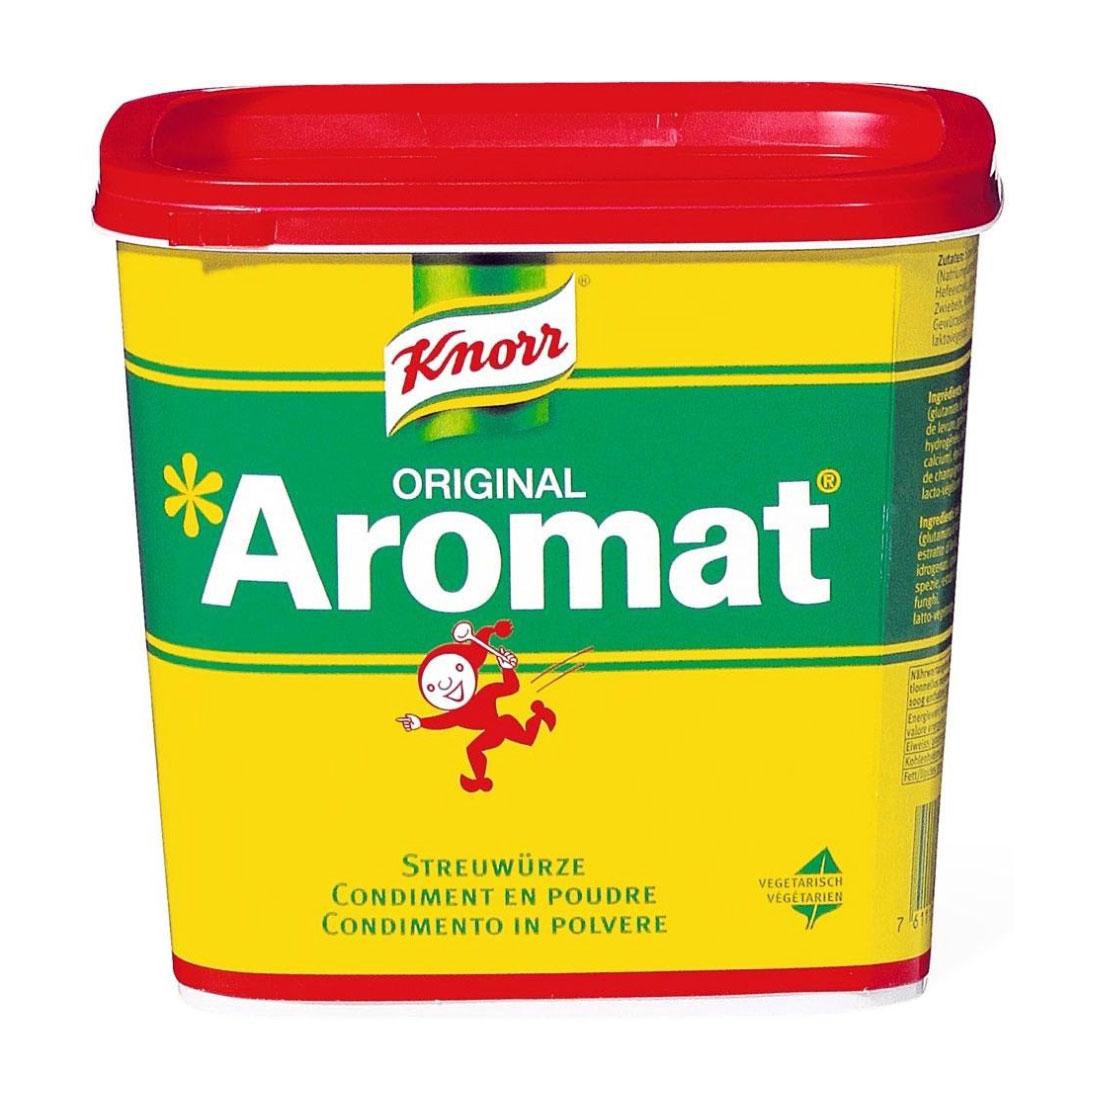 Knorr Aromat 900g